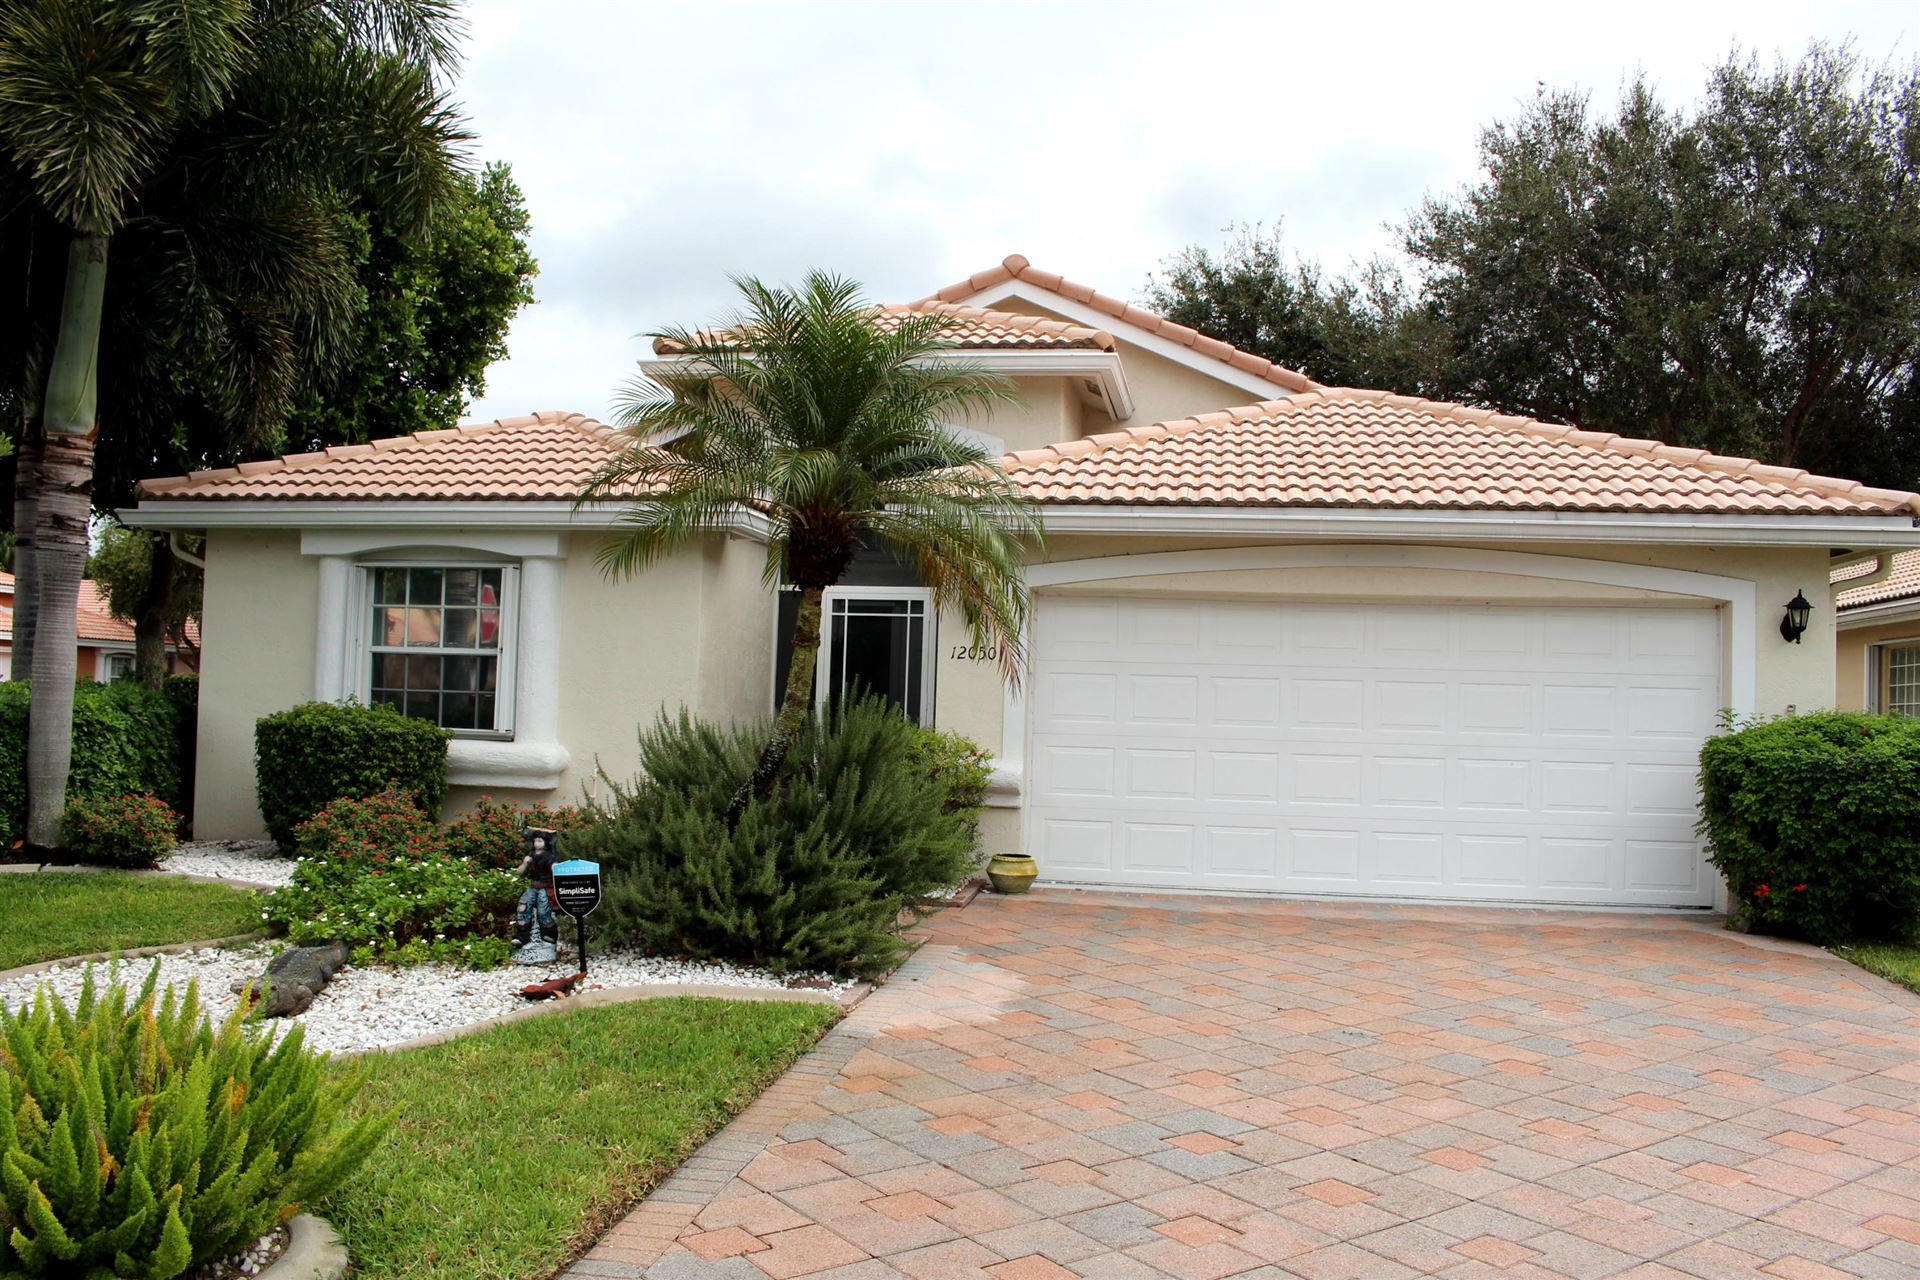 12050 Aprilia Drive, Boynton Beach, FL 33437 - #: RX-10661023